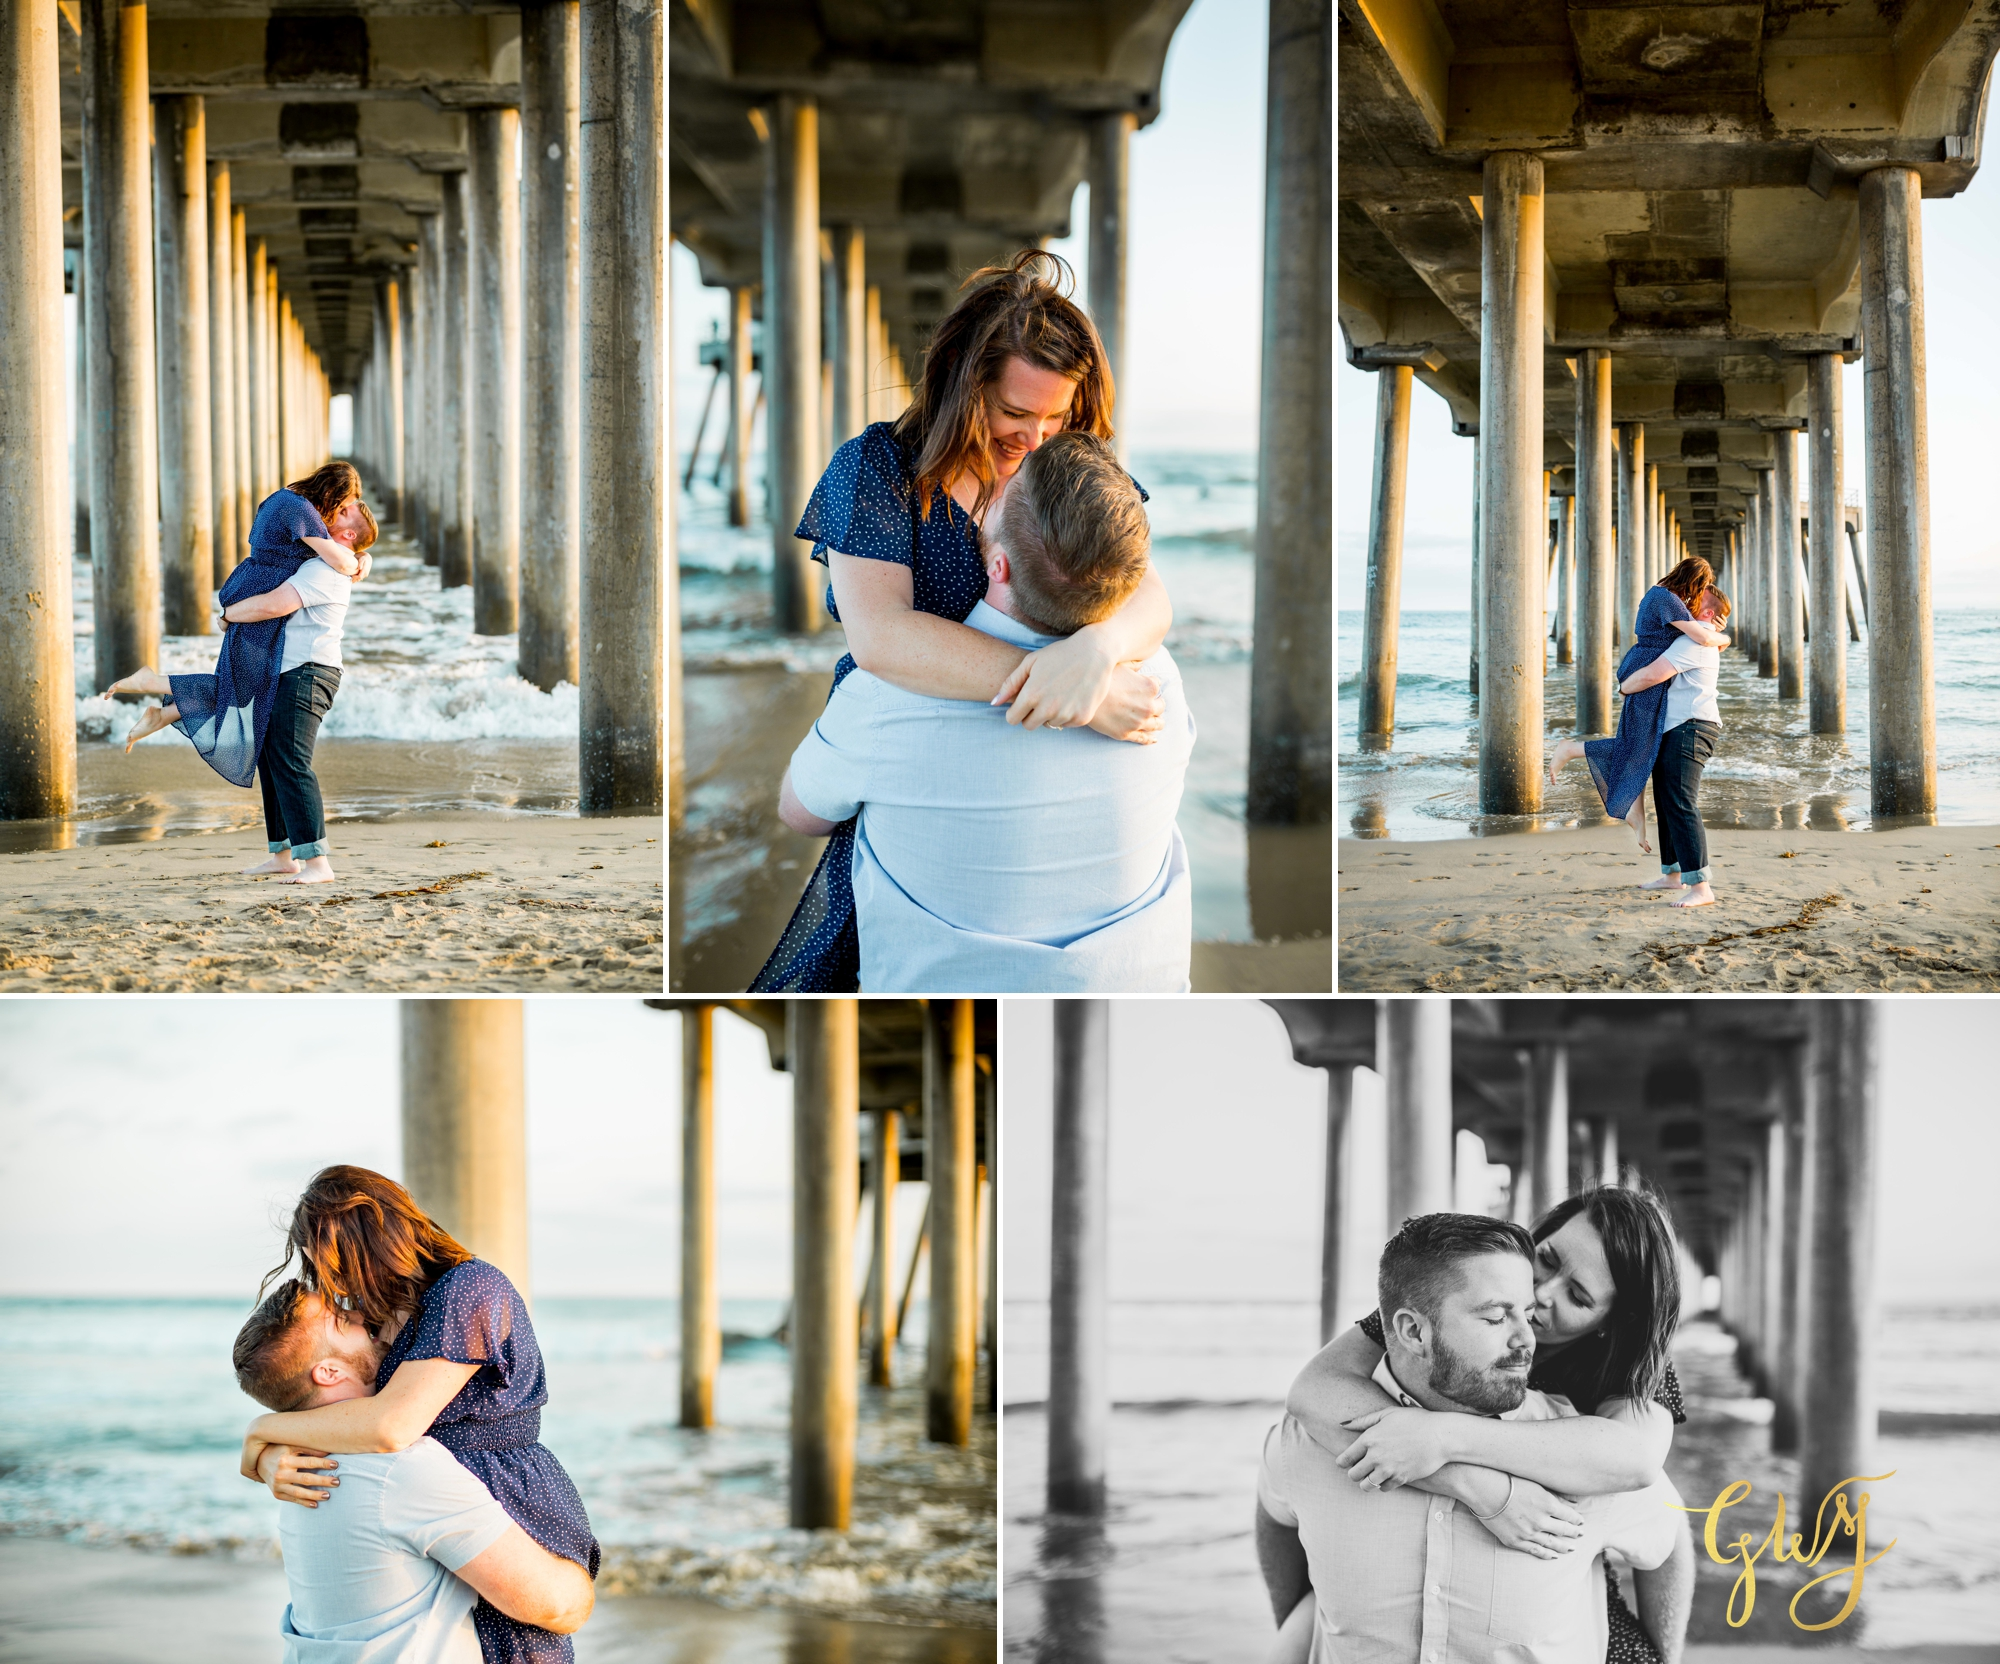 Cristina + David's Huntington Beach Central Park Romantic Sunset Engagement Session by Glass Woods Media 12.jpg